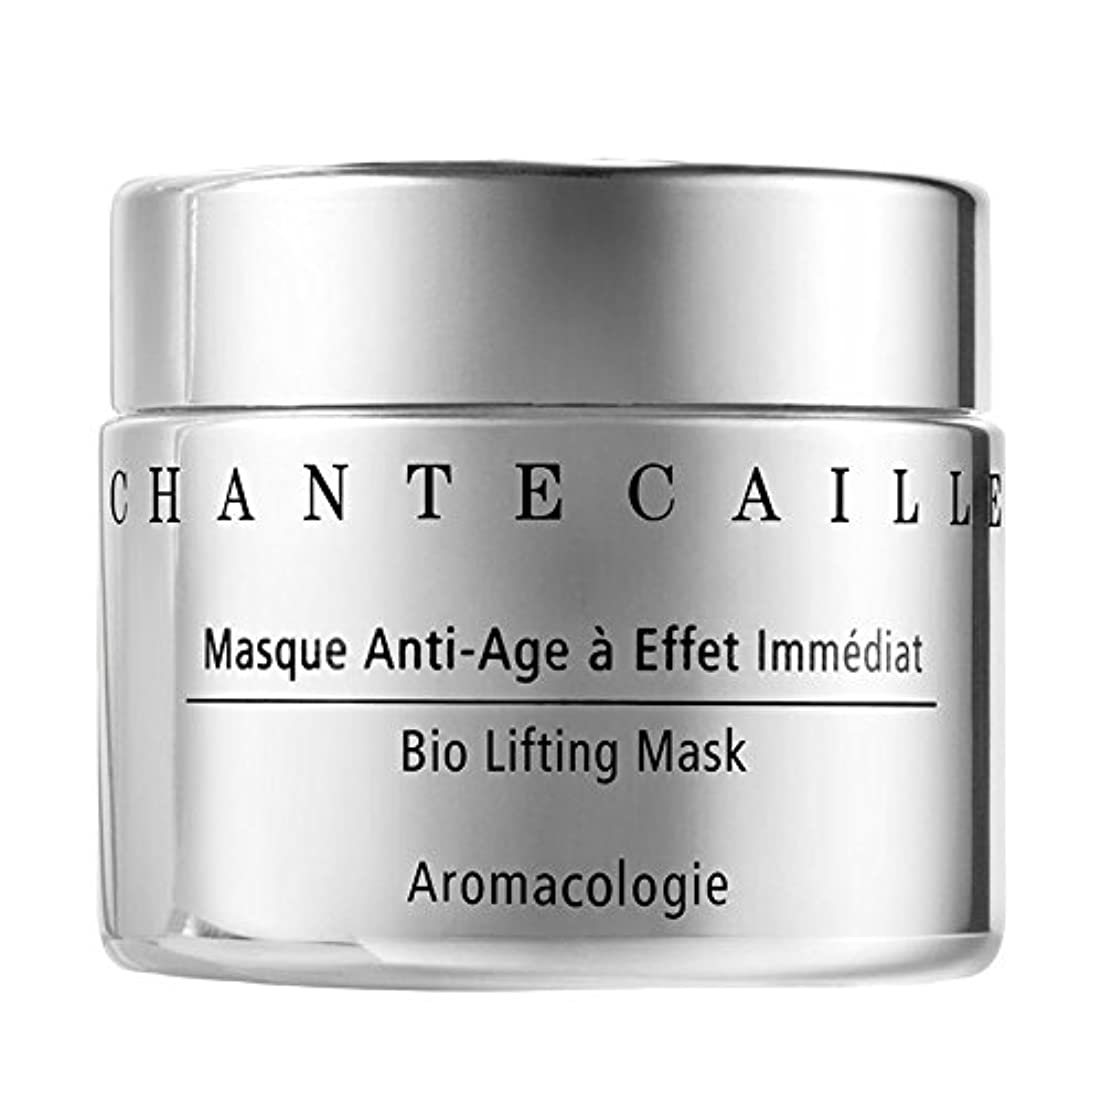 Chantecaille Biodynamic Lifting Mask (Pack of 6) - シャンテカイユバイオダイナミックリフティングマスク x6 [並行輸入品]